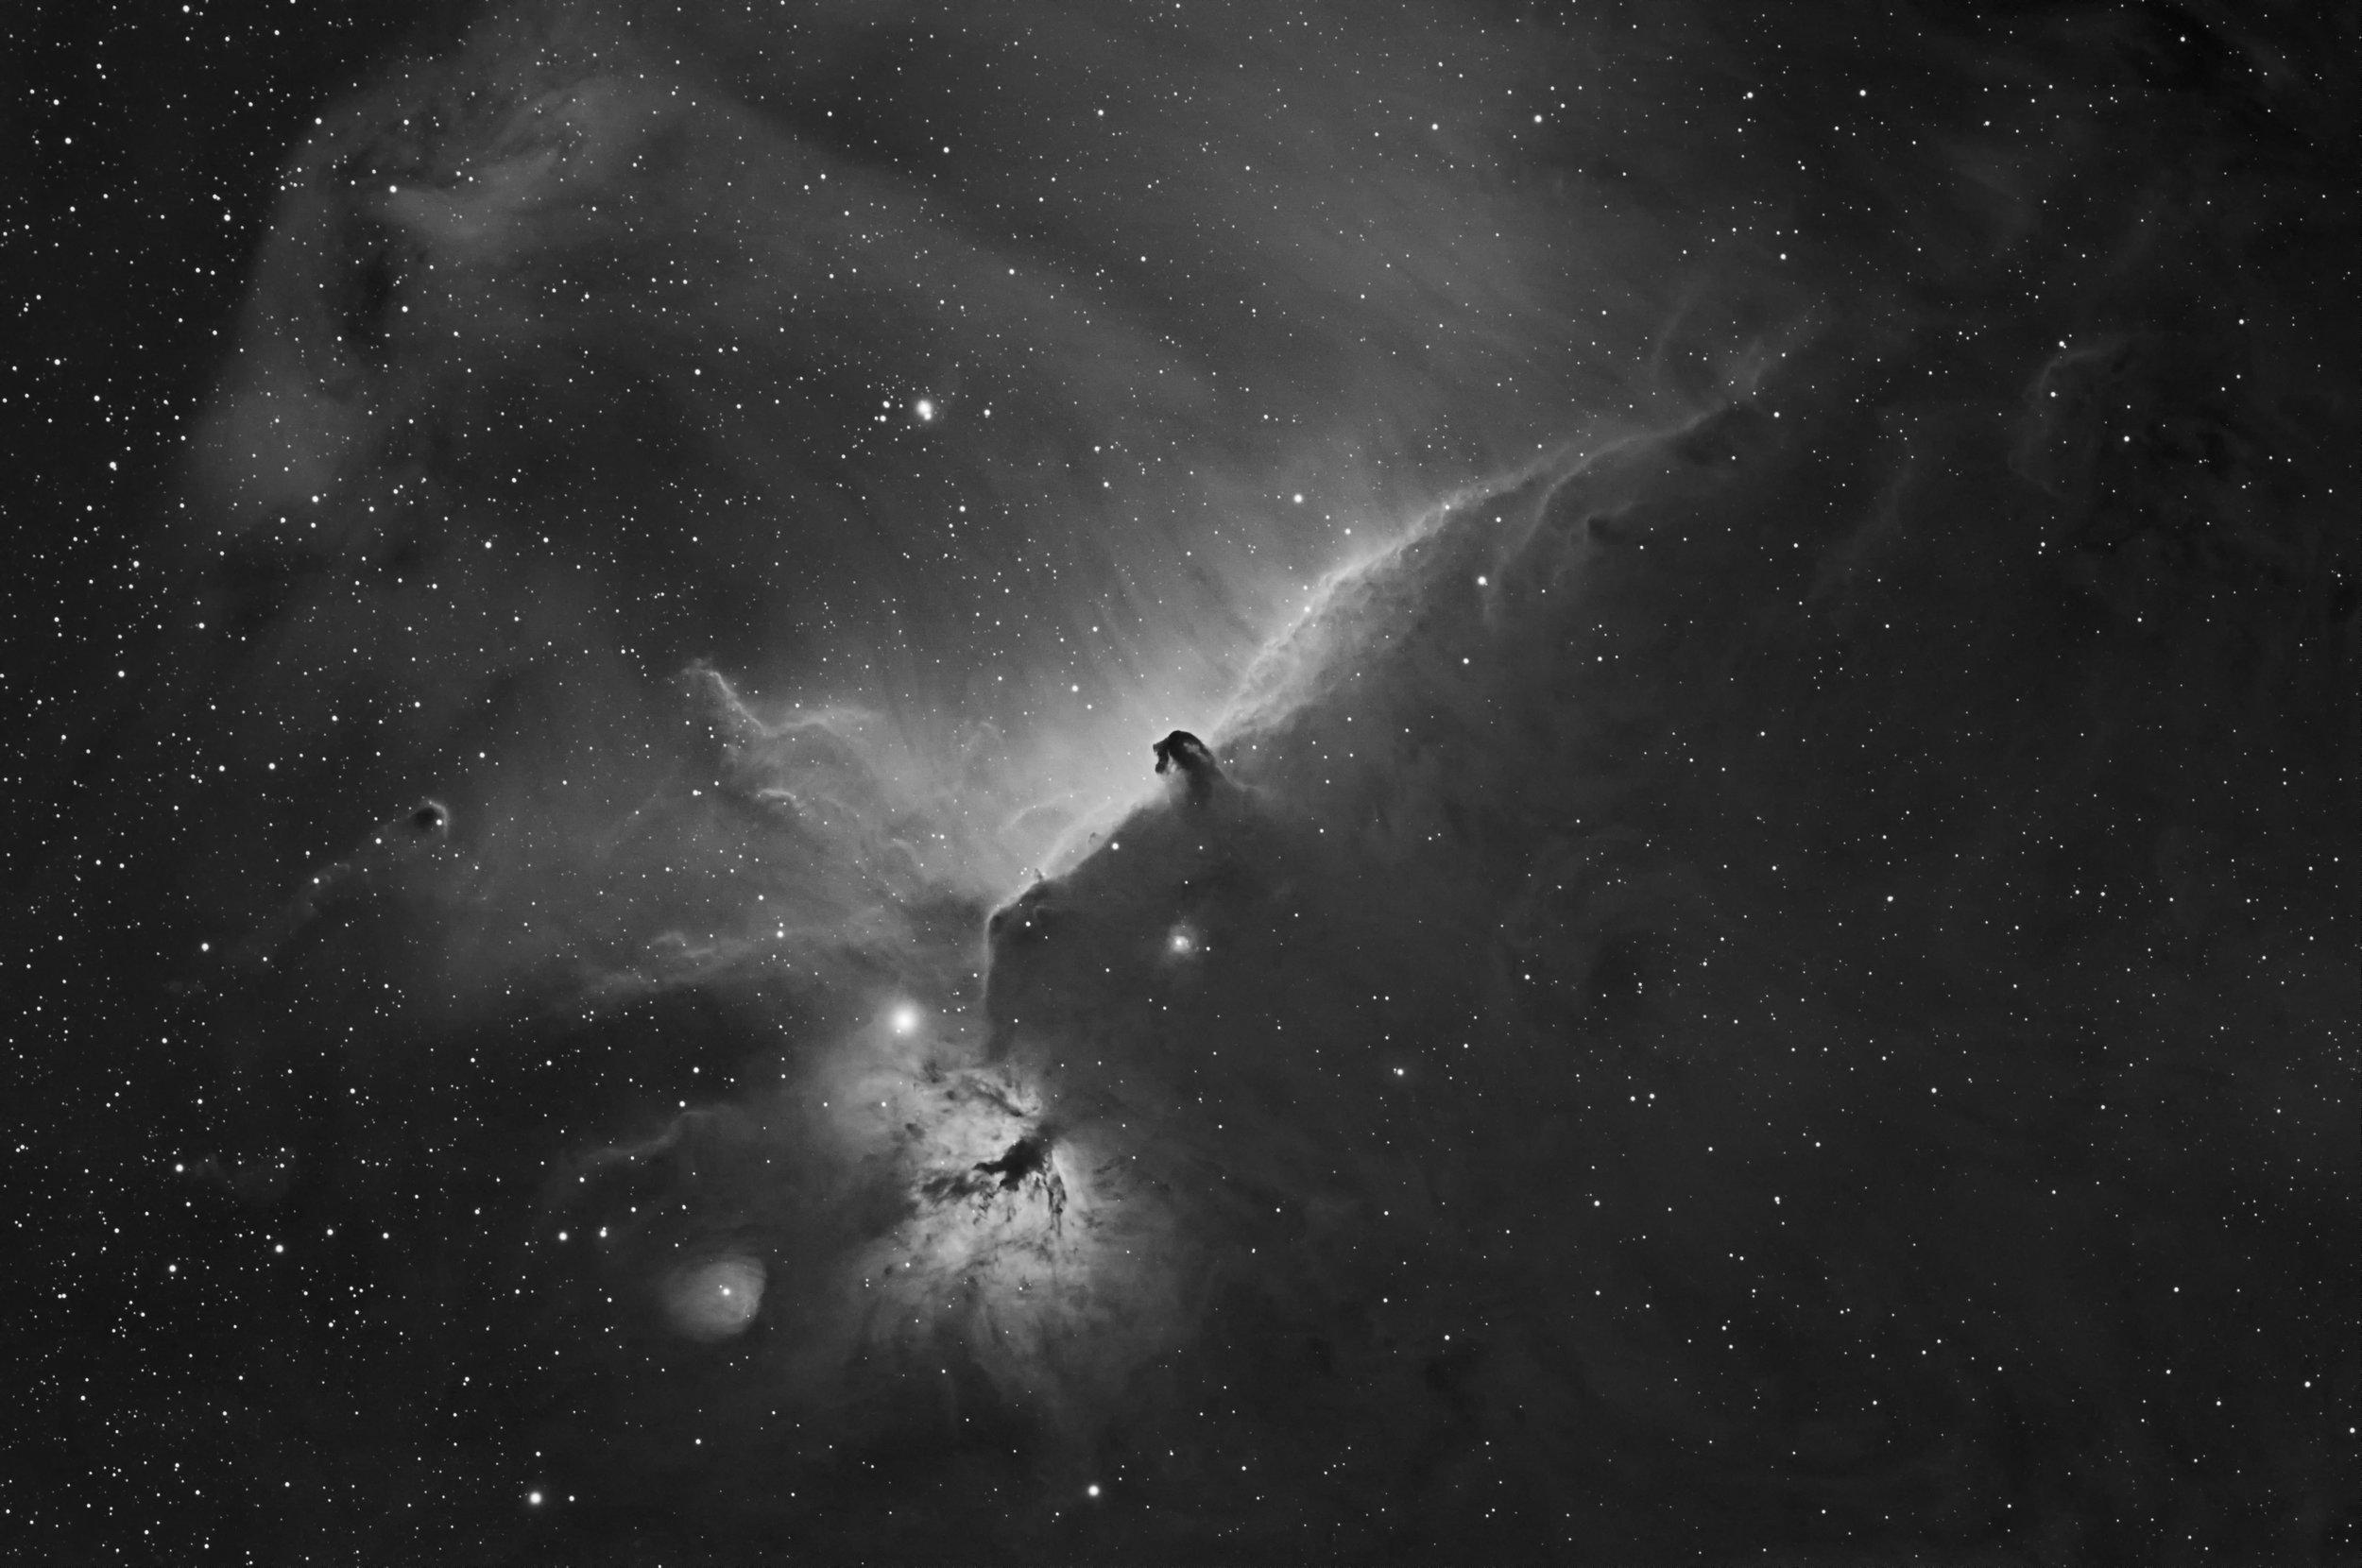 IC434_Oct13_QHY367C_TAK130_24x600_MS_final.jpg